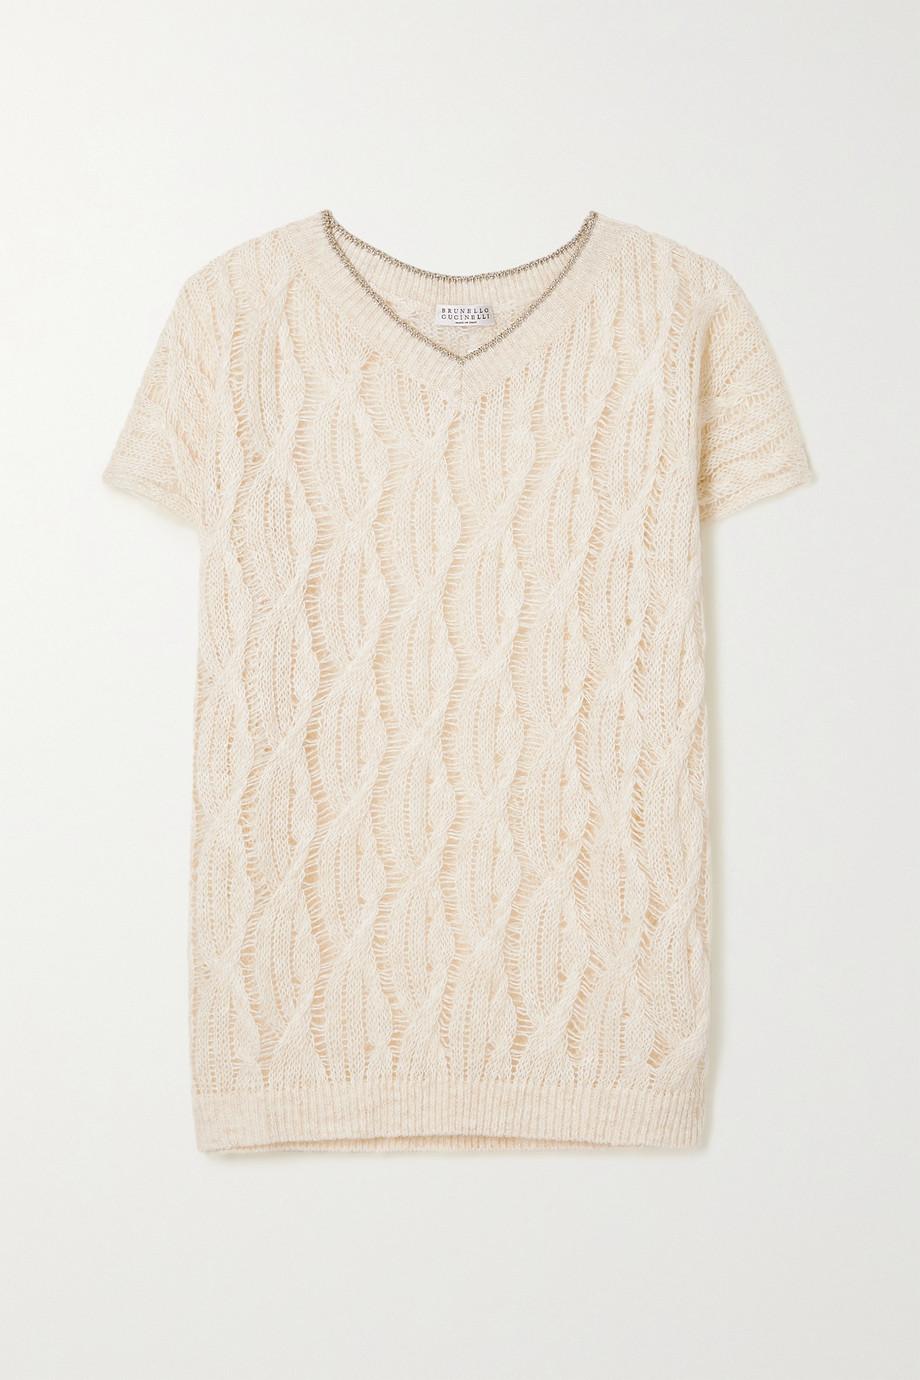 Brunello Cucinelli Metallic-trimmed cable-knit linen-blend sweater